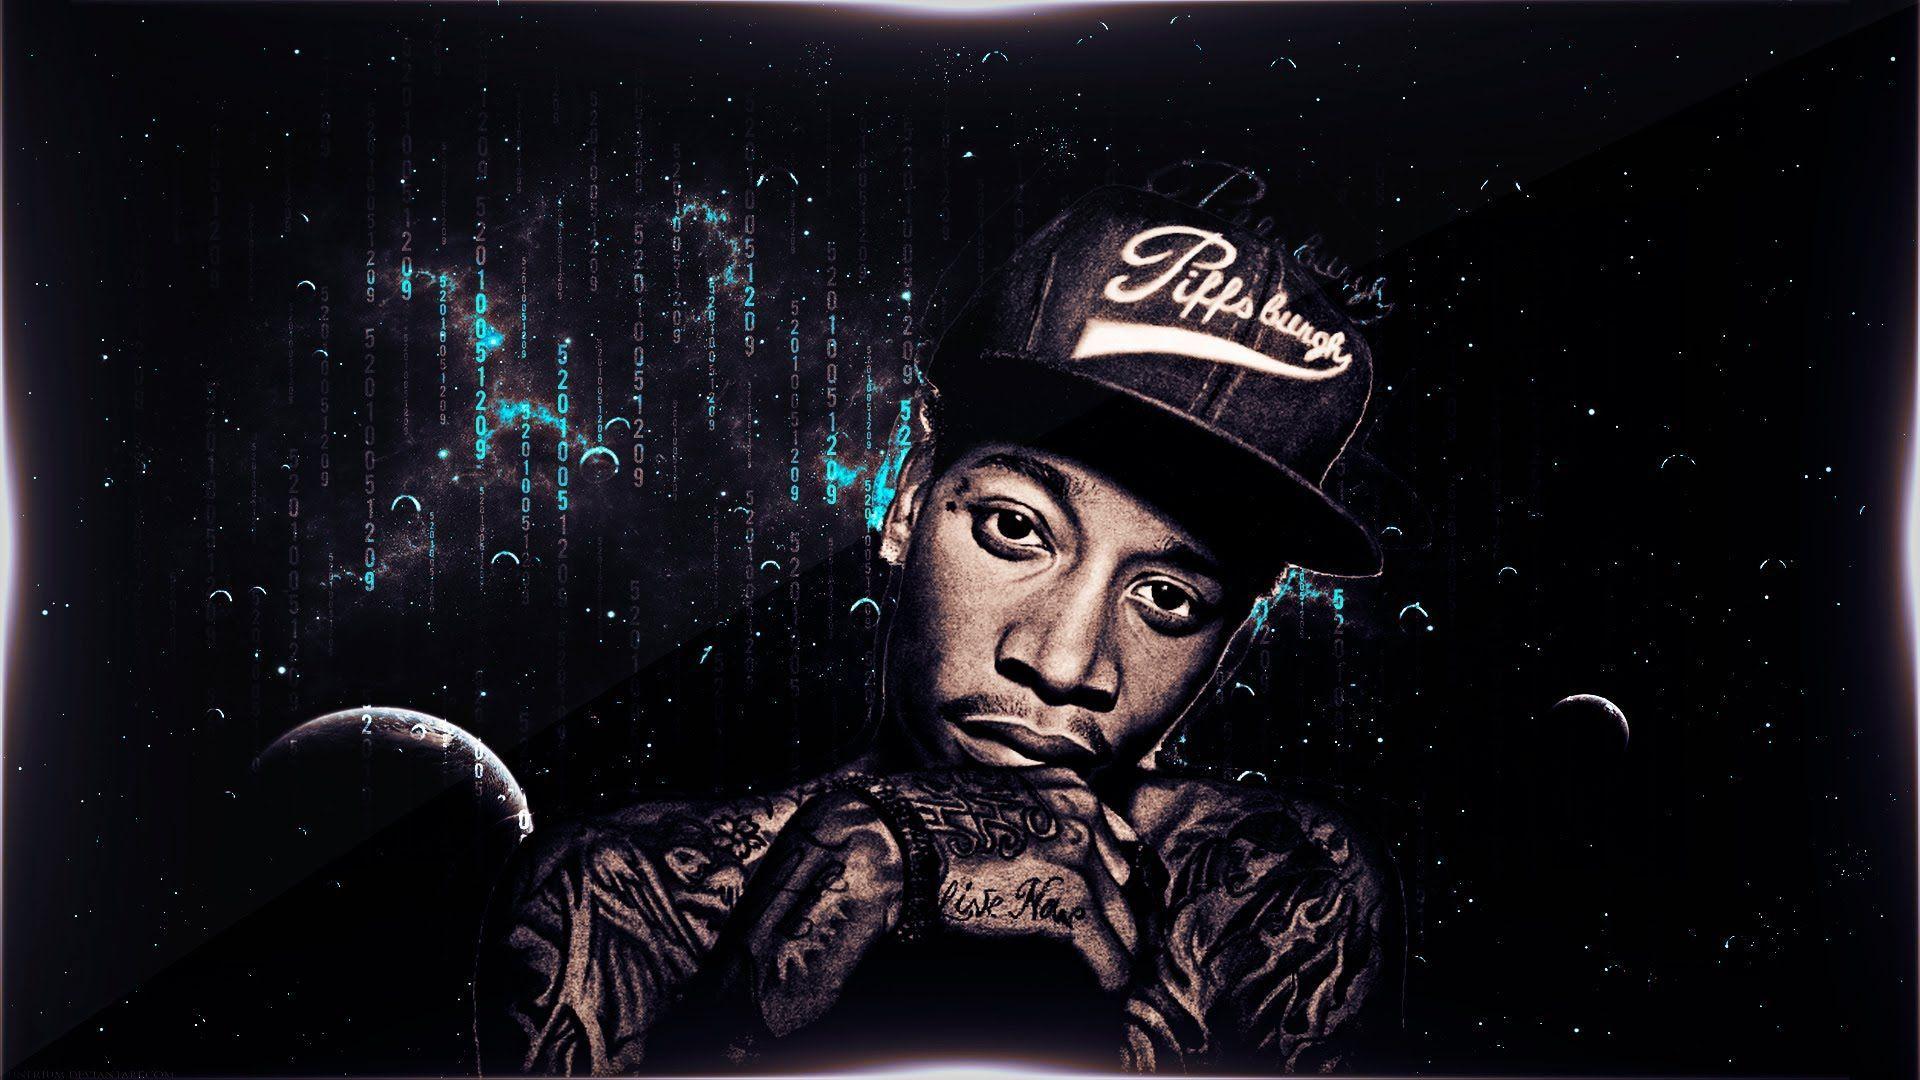 Taylor Gang Iphone Wallpaper Wiz Khalifa Hd Wallpaper Background Image 1920x1080